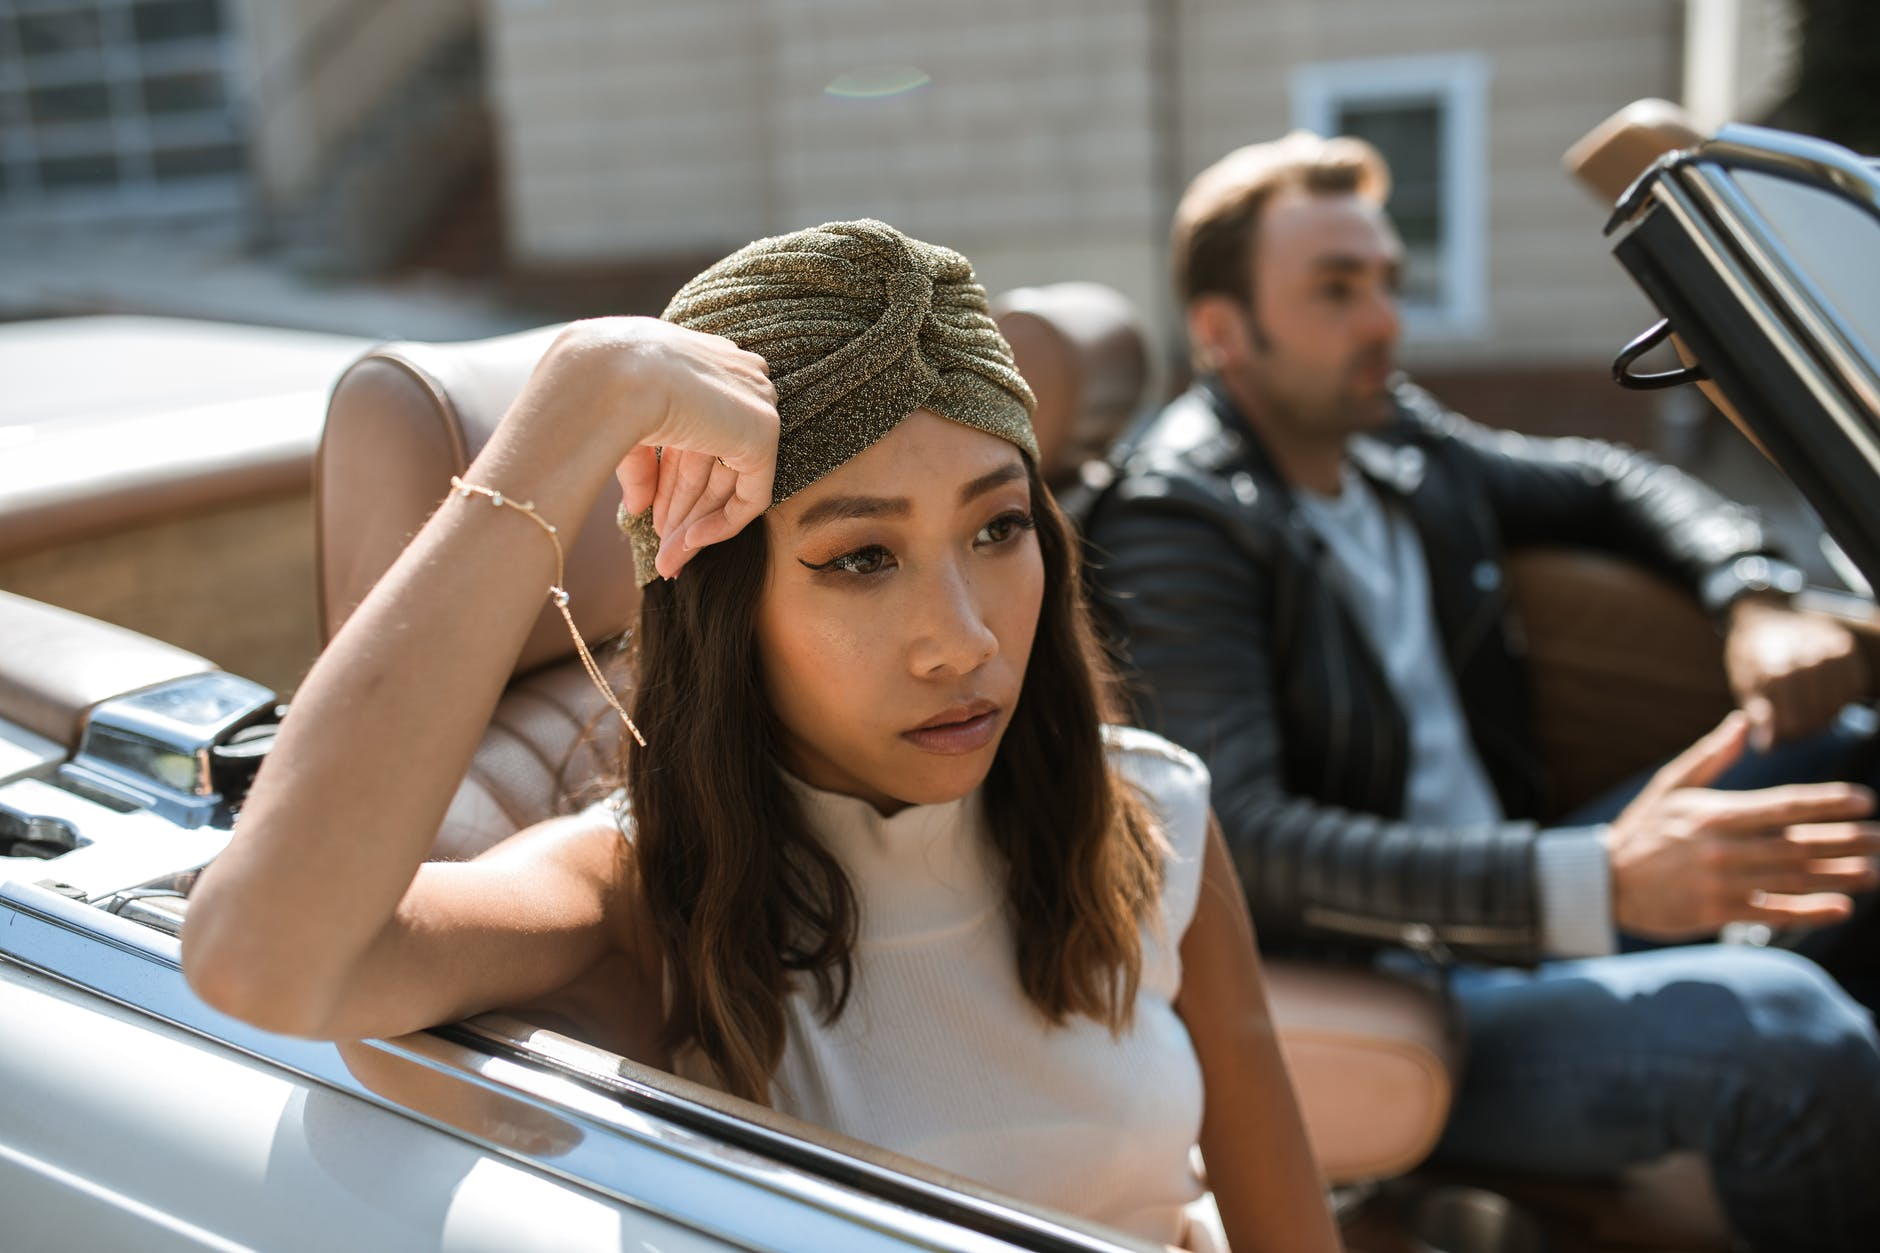 Staromodni muškarci i moderne žene  woman in white tank top sitting in a car feeling annoyed